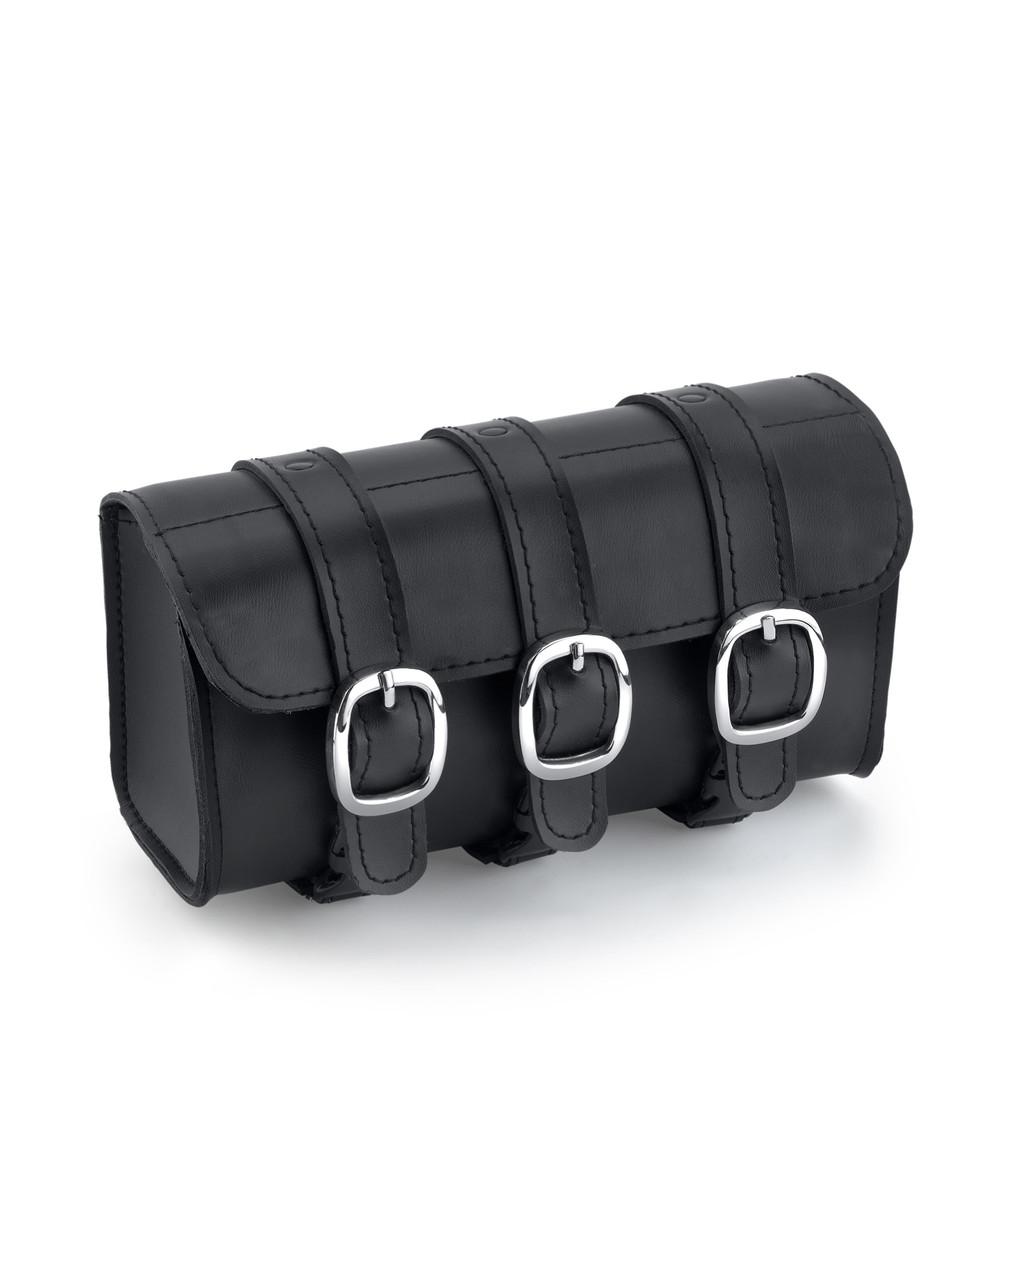 Honda Trianion Plain Motorcycle Tool Bag Main Bag View